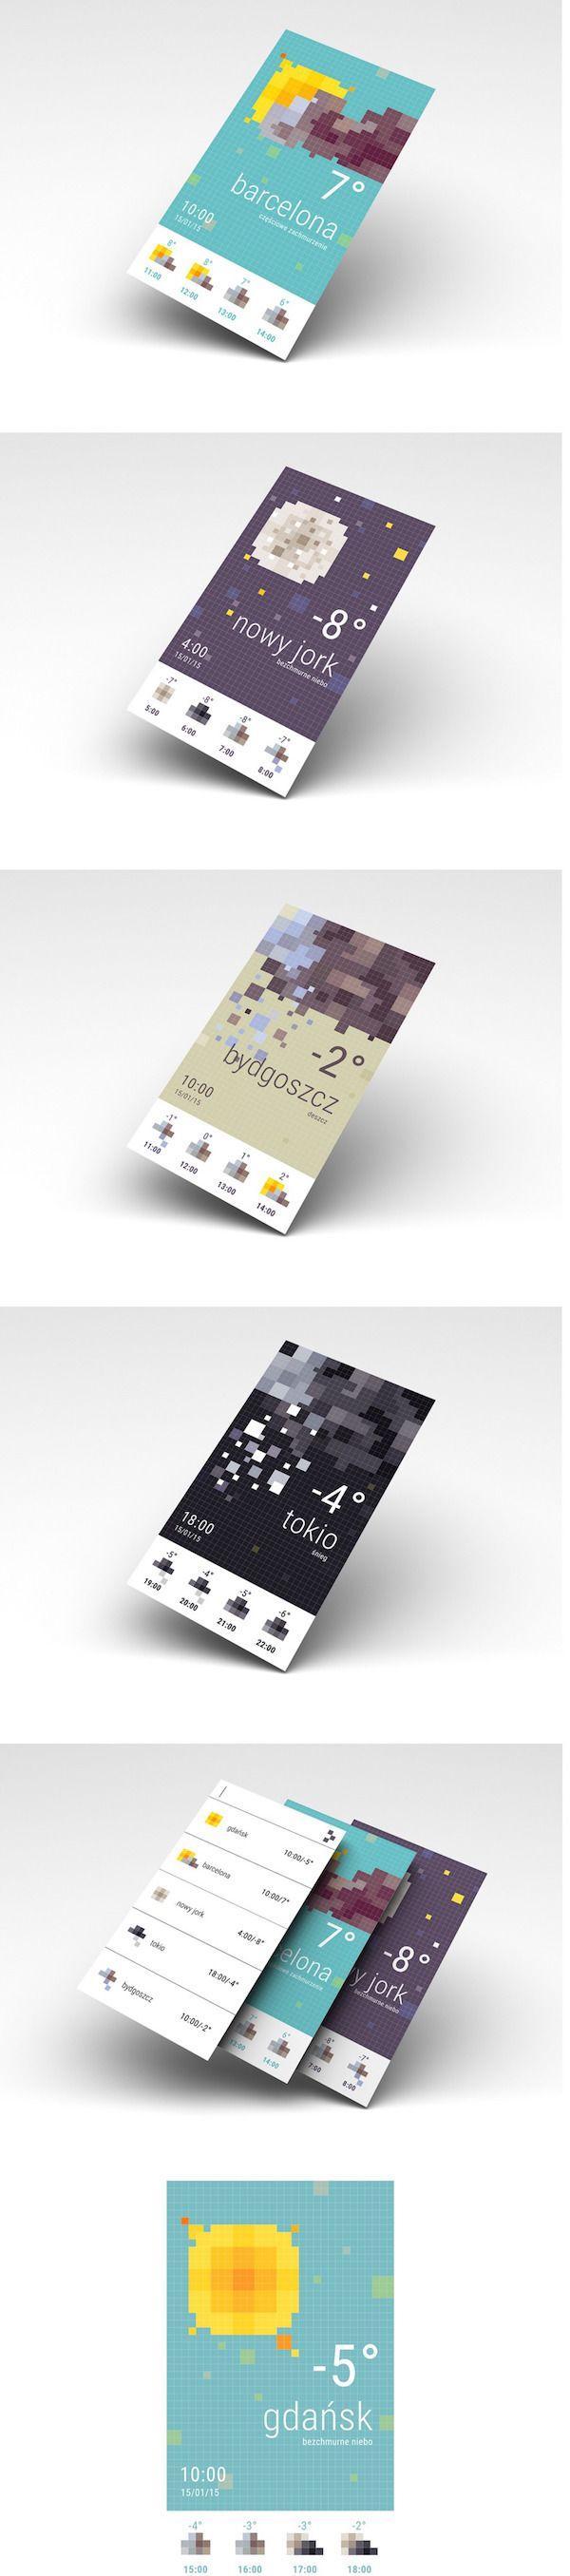 weather-mobile-app-ui